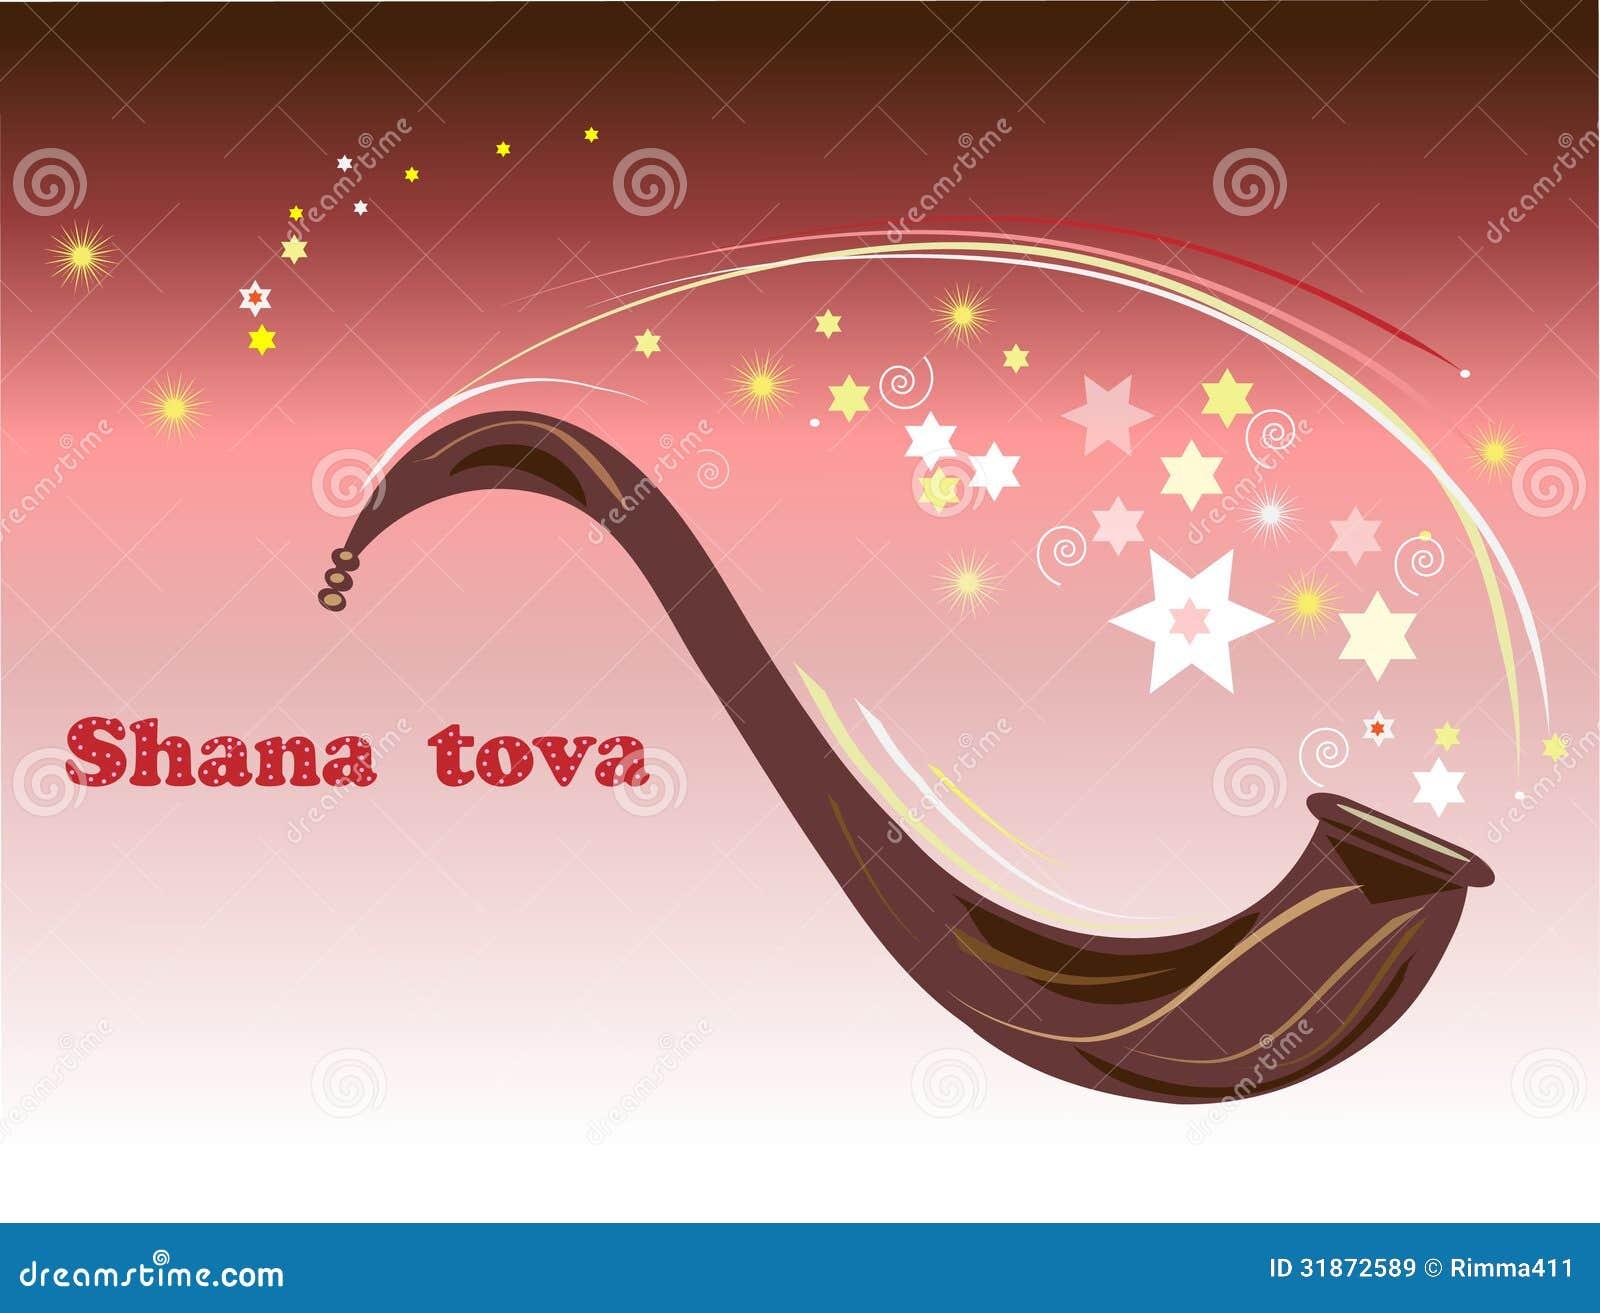 Shana tova holiday greeting card stock illustration shana tova holiday greeting card kristyandbryce Images